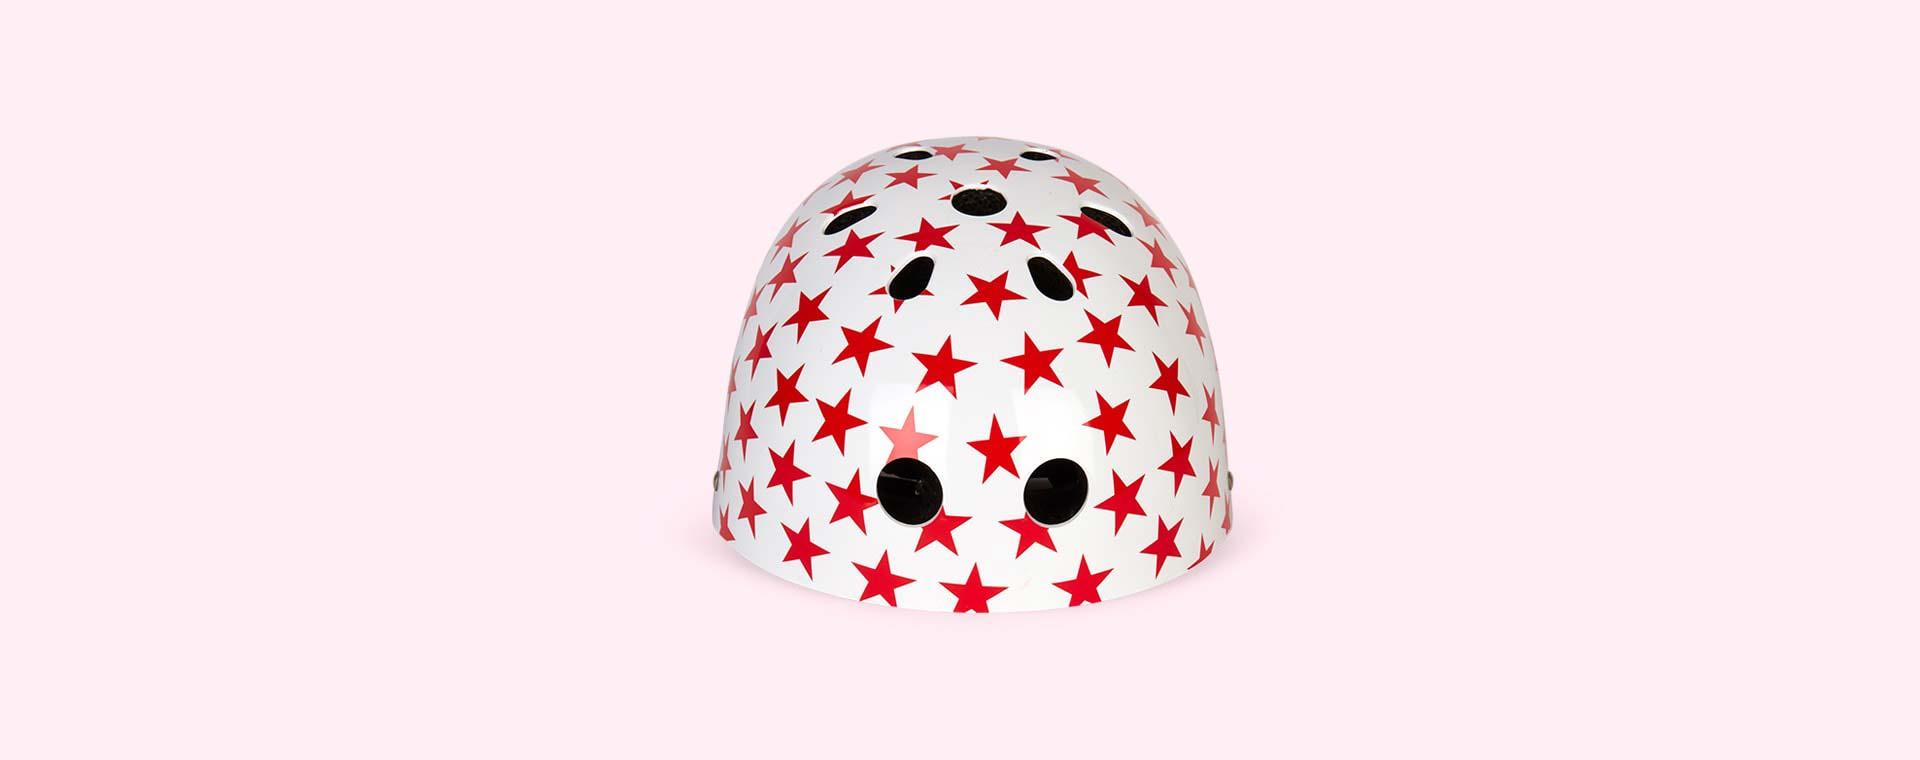 Star CoConuts Helmet